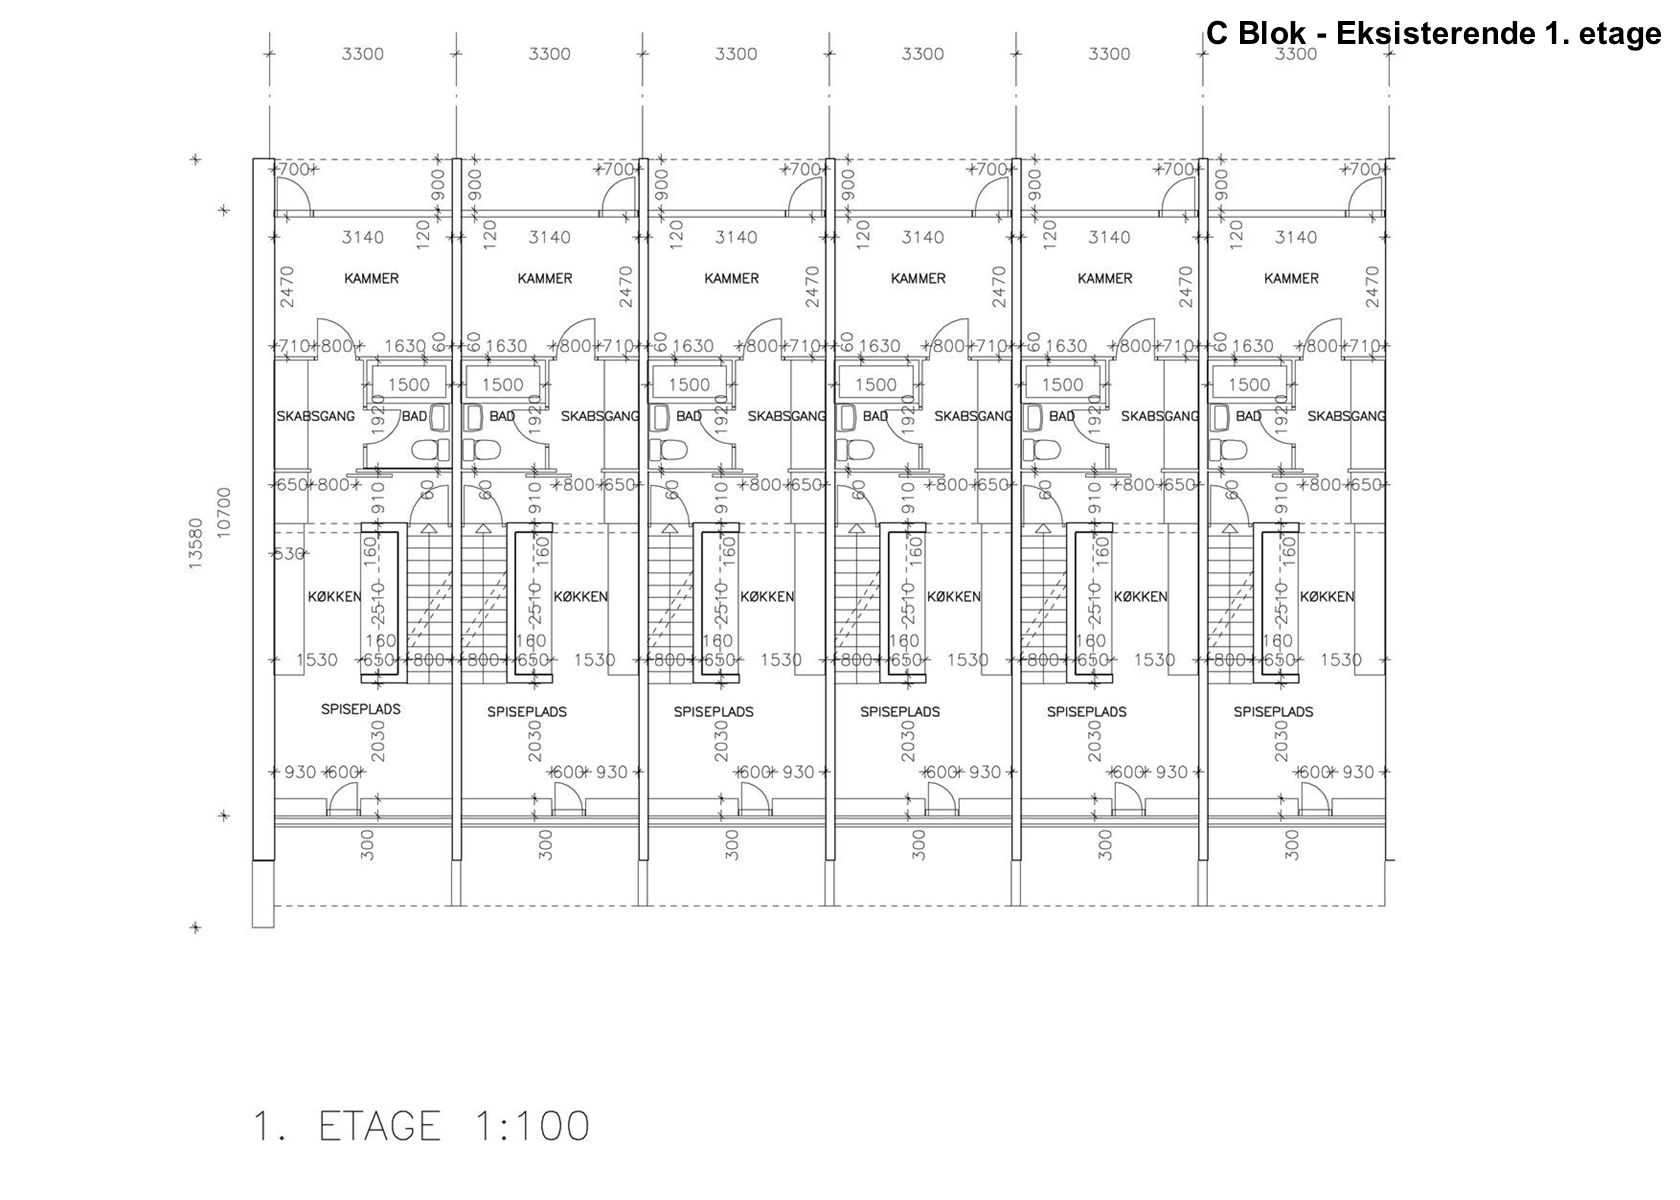 C Blok - Eksisterende 1. etage